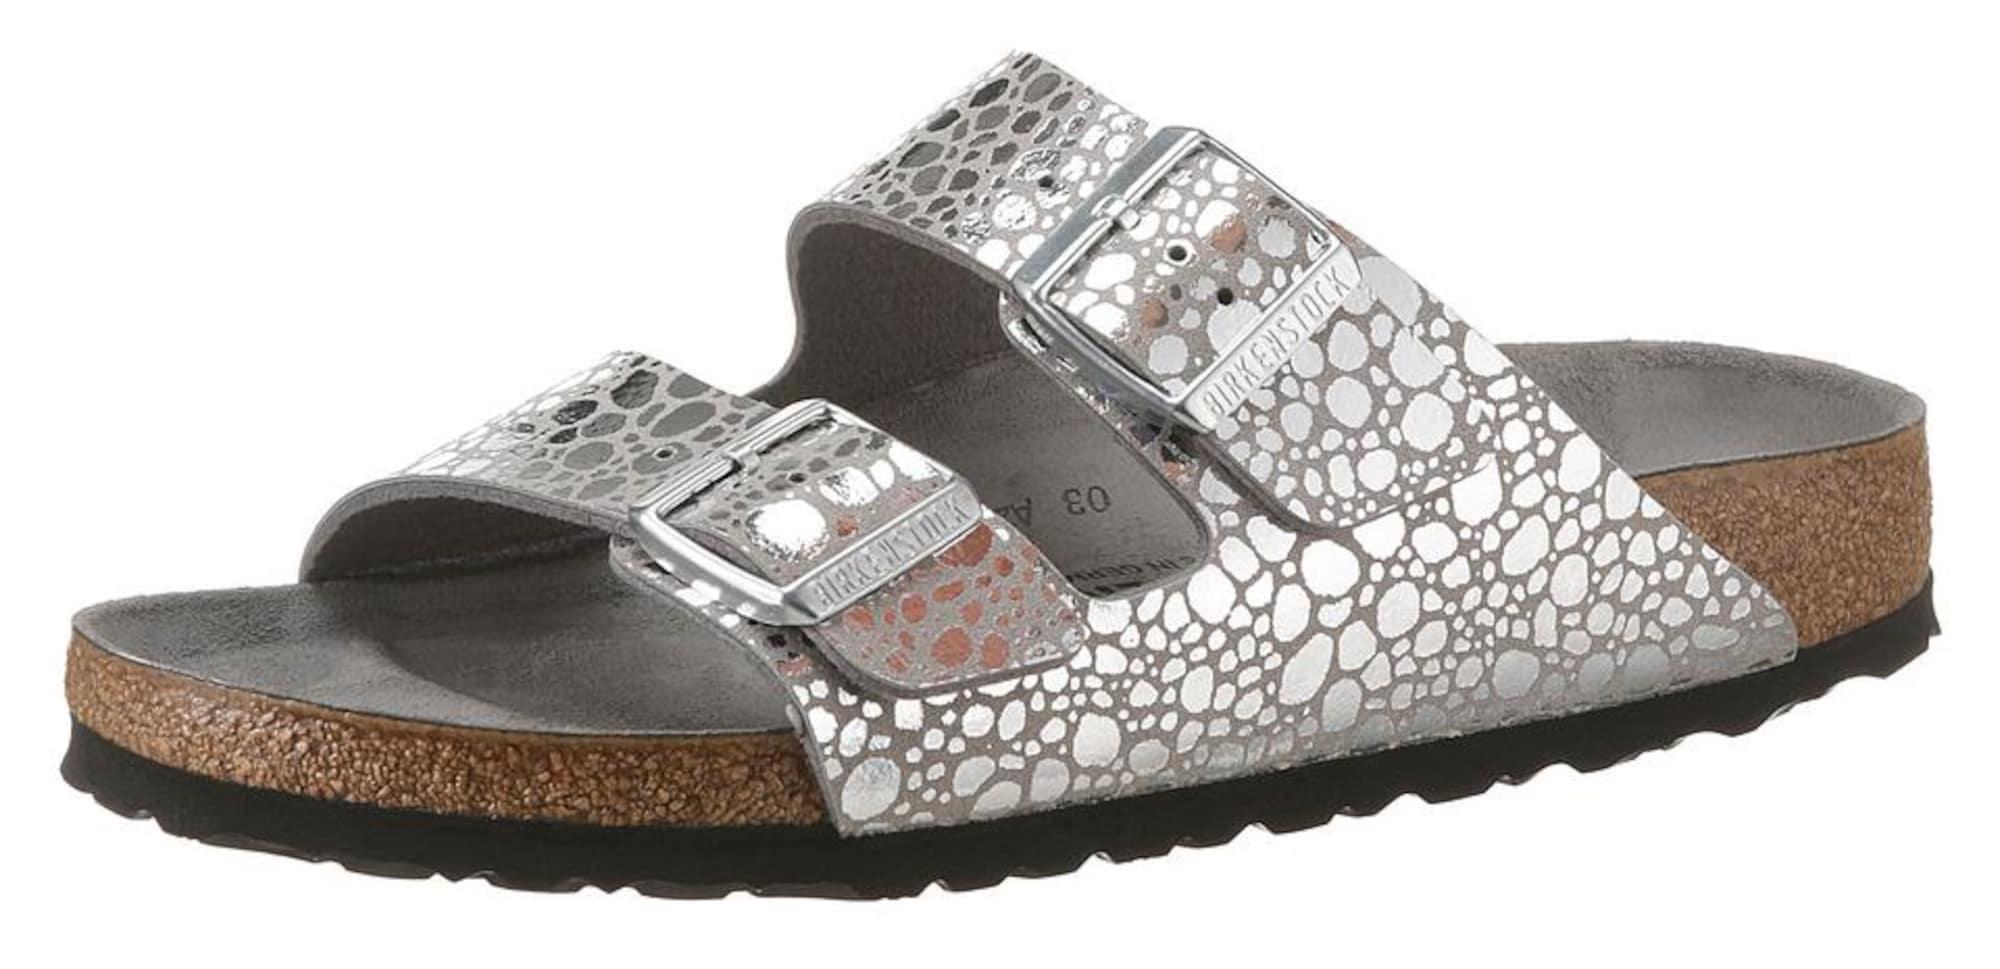 Pantolette 'Arizona'   Schuhe   Silber   Birkenstock